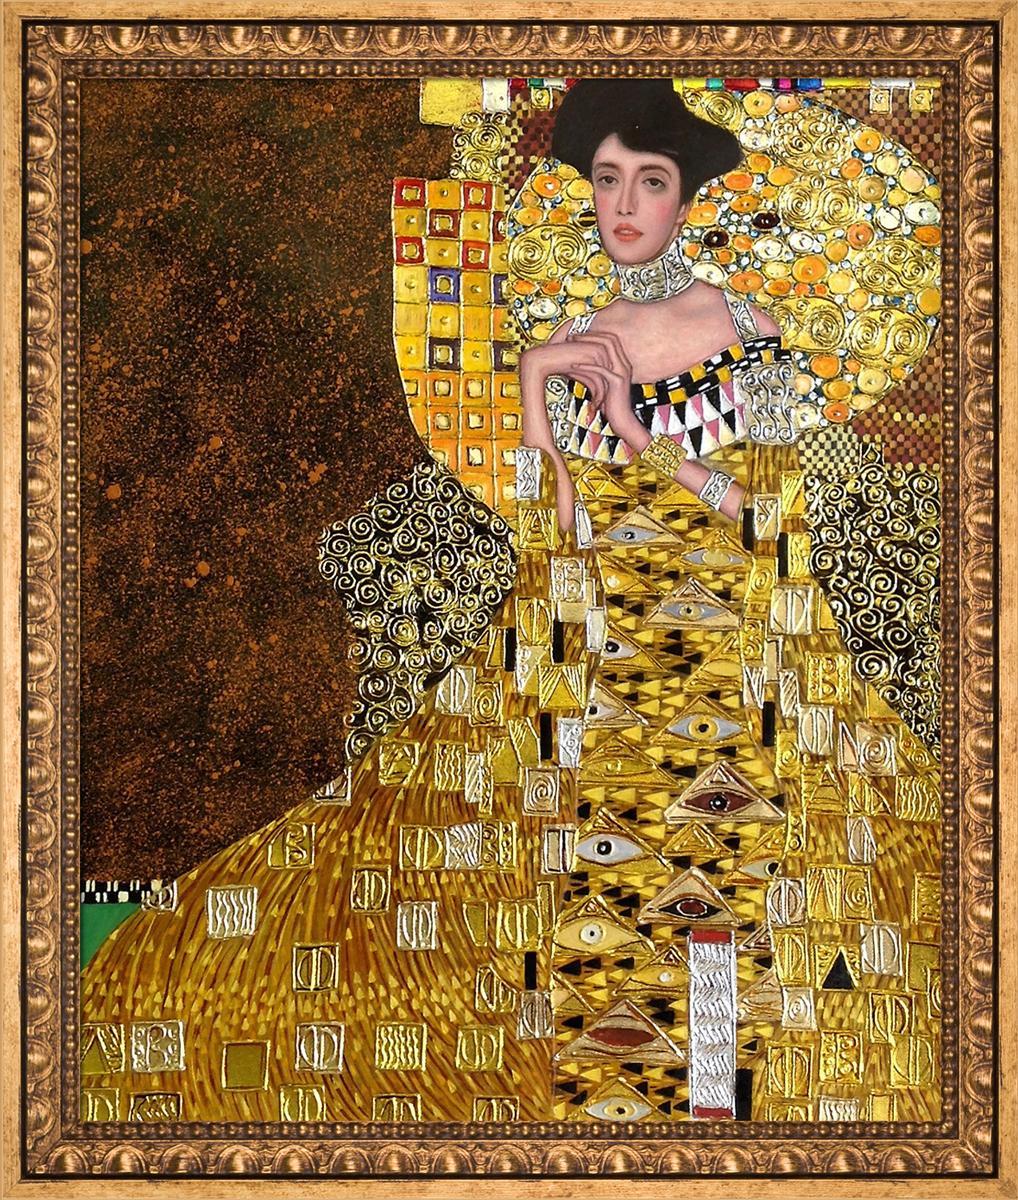 Portrait of Adele Bloch Bauer I (Luxury Line) Pre-Framed